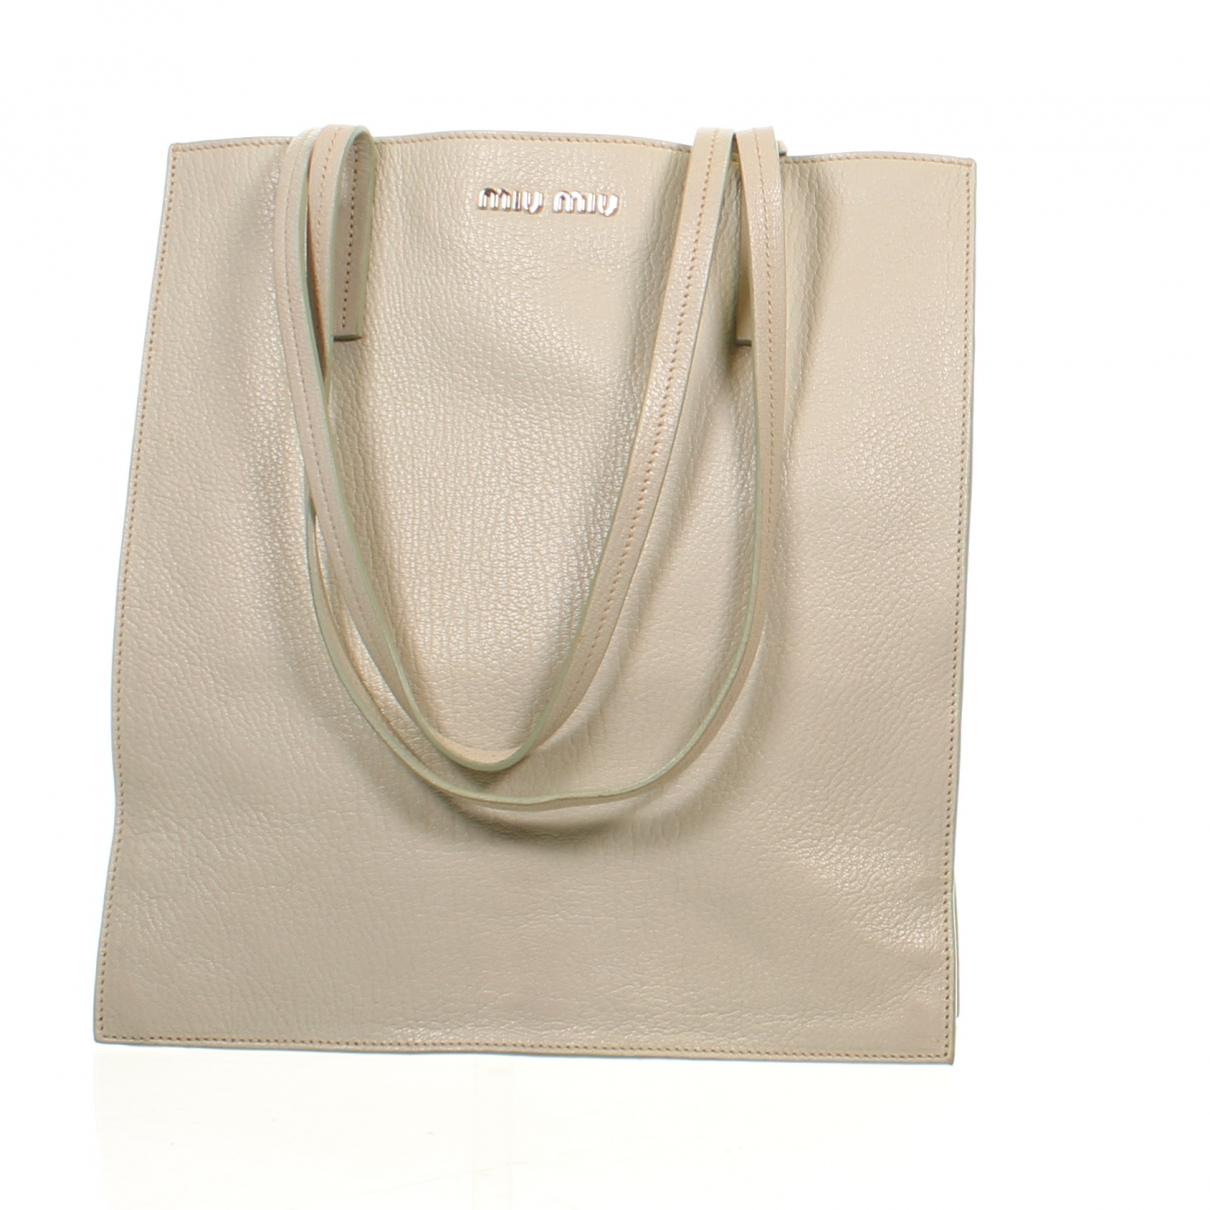 Miu Miu Madras Handtasche in  Gruen Leder